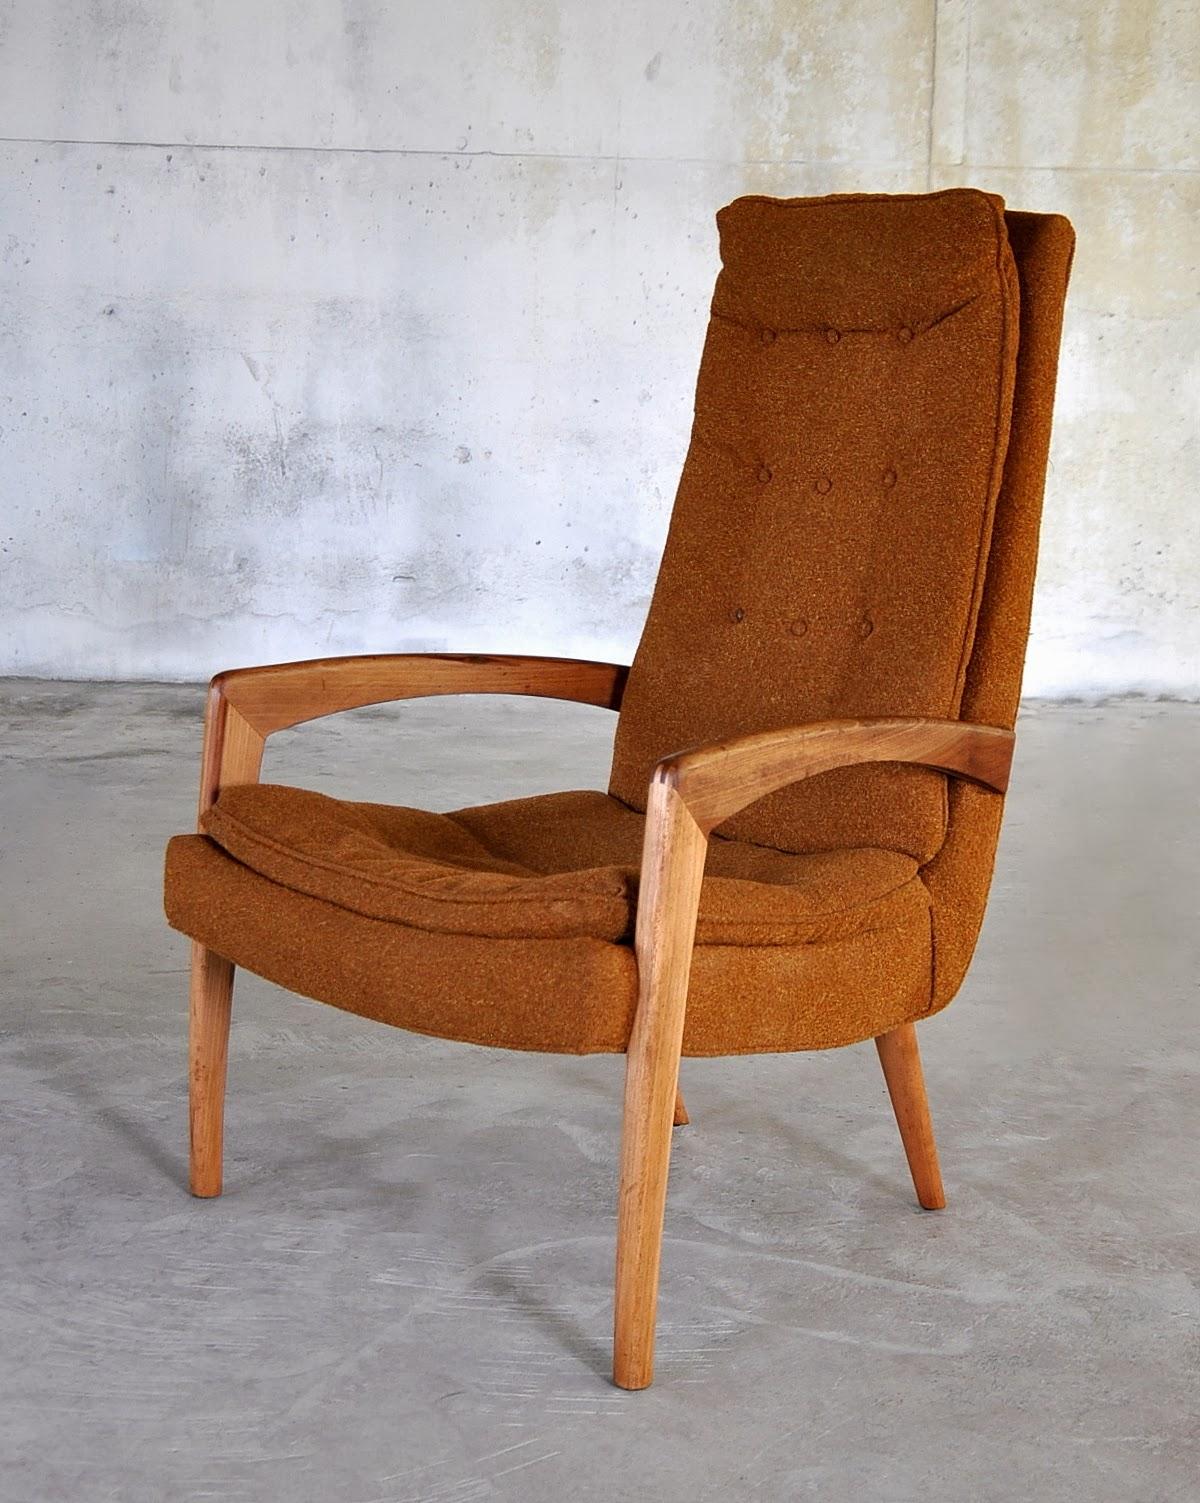 adrian pearsall chair designs revolving barber select modern february 2014